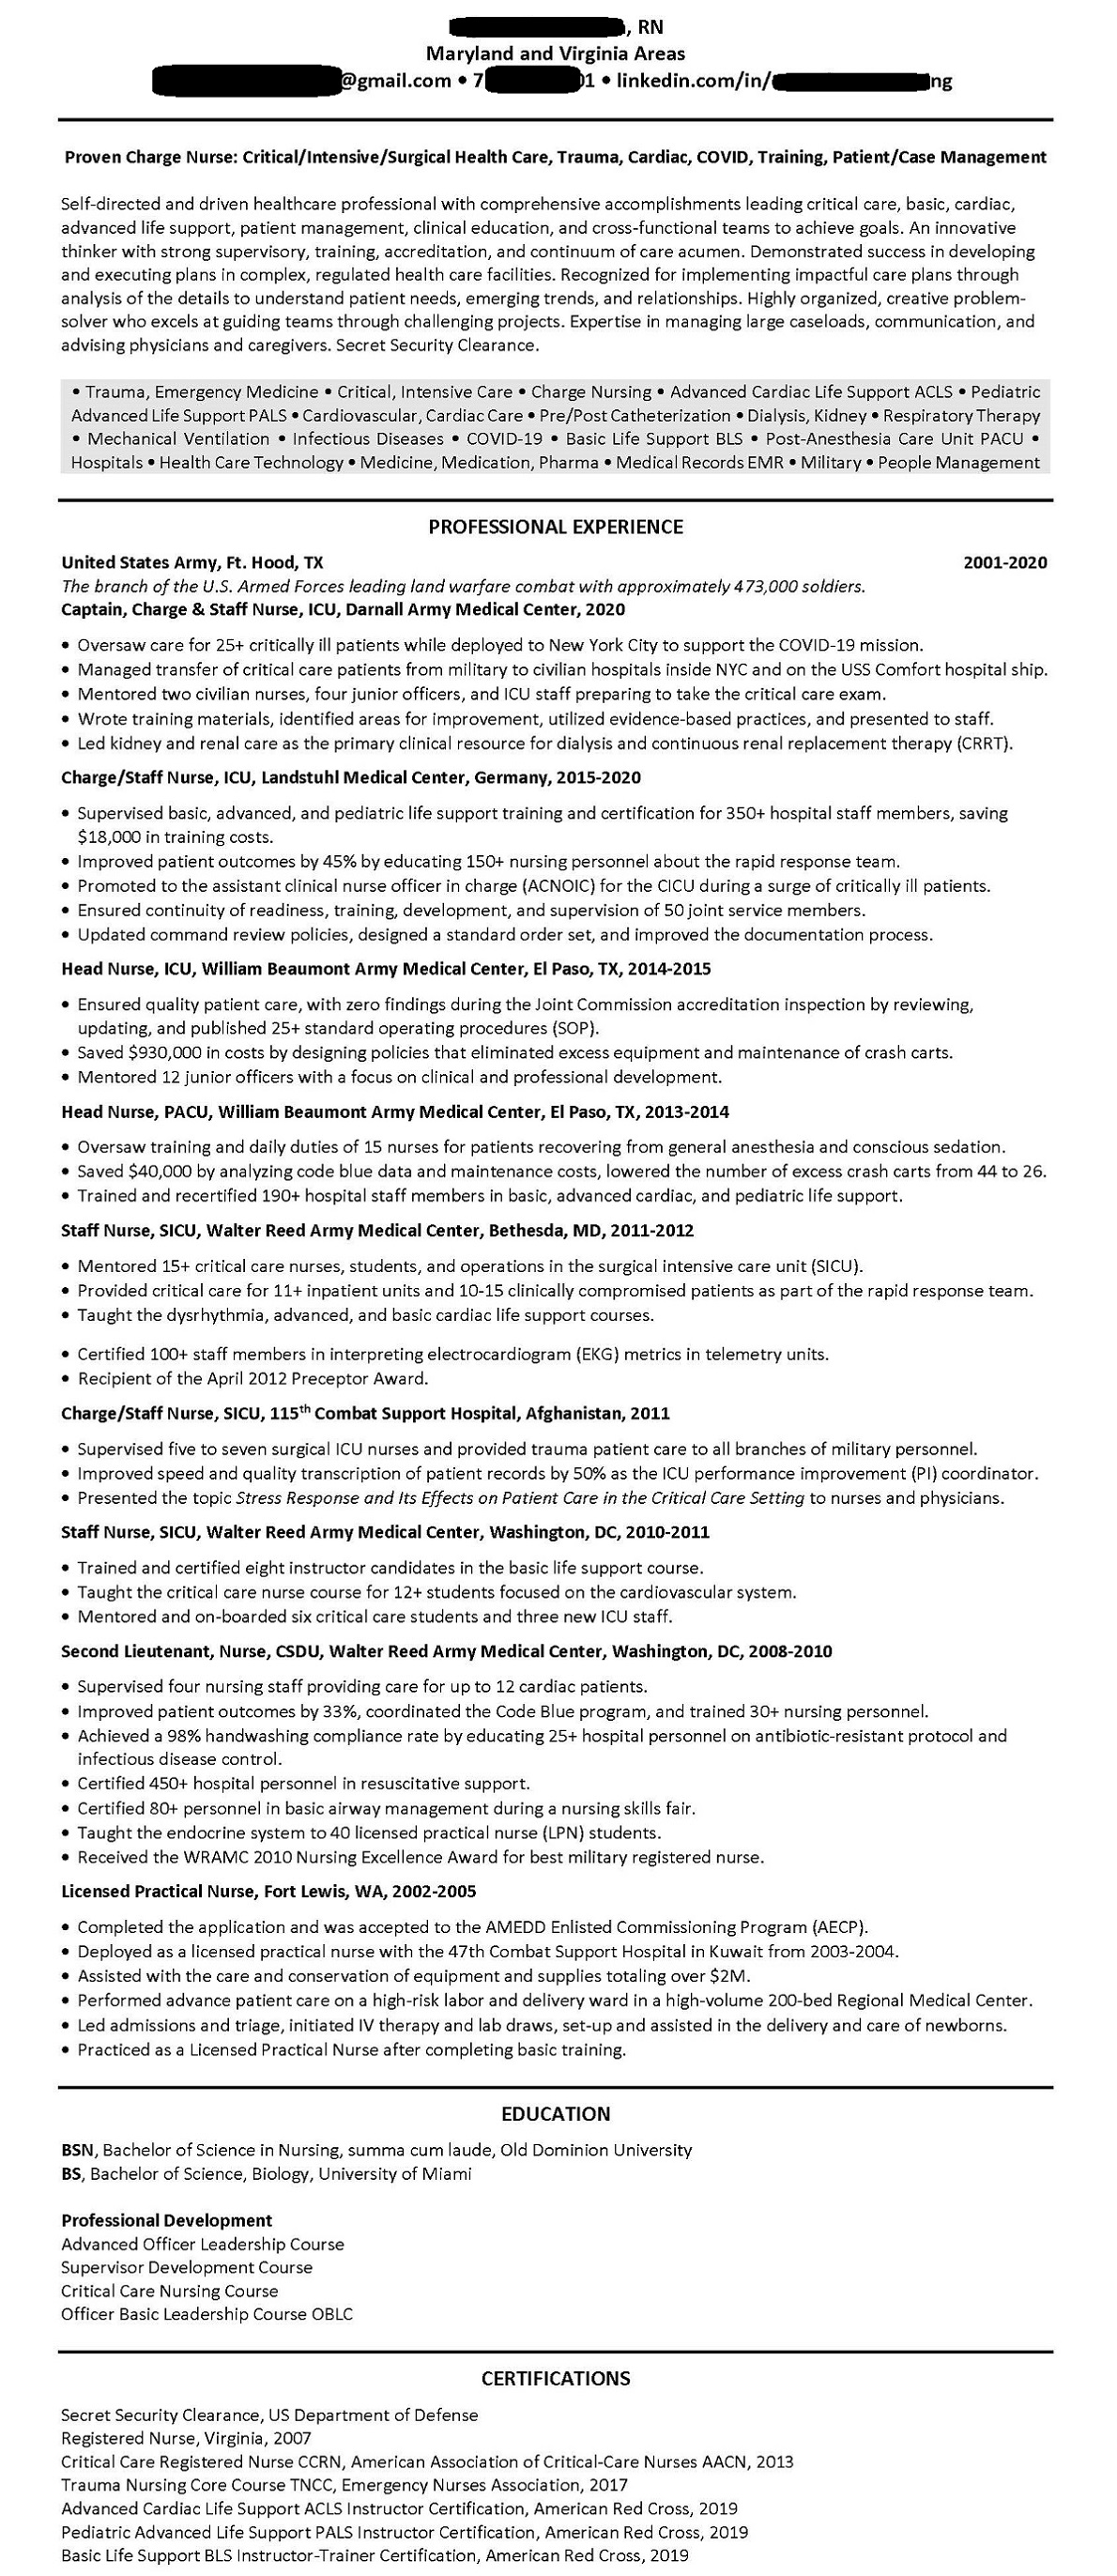 Resume 3248b